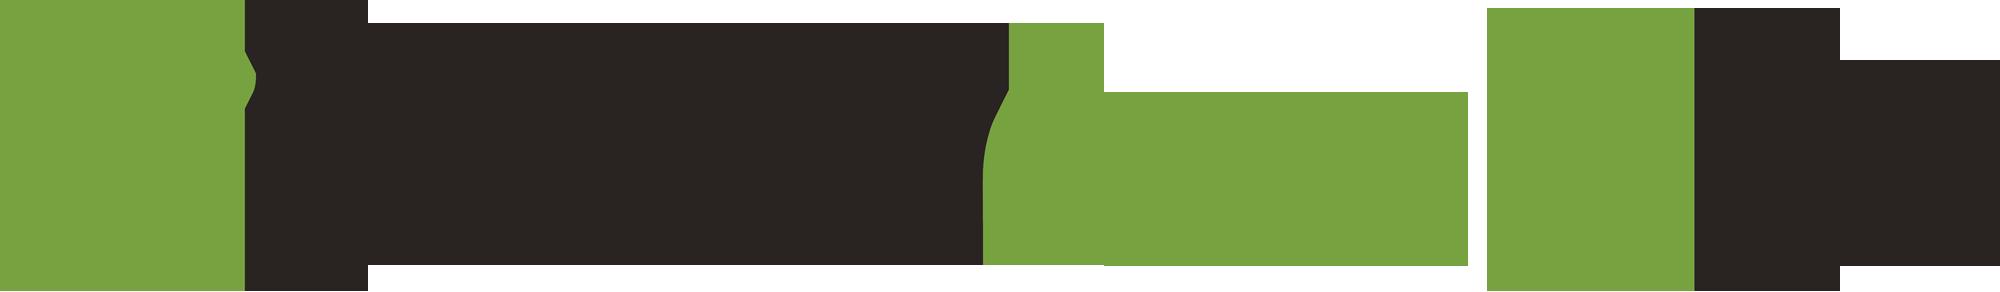 WildCare logo